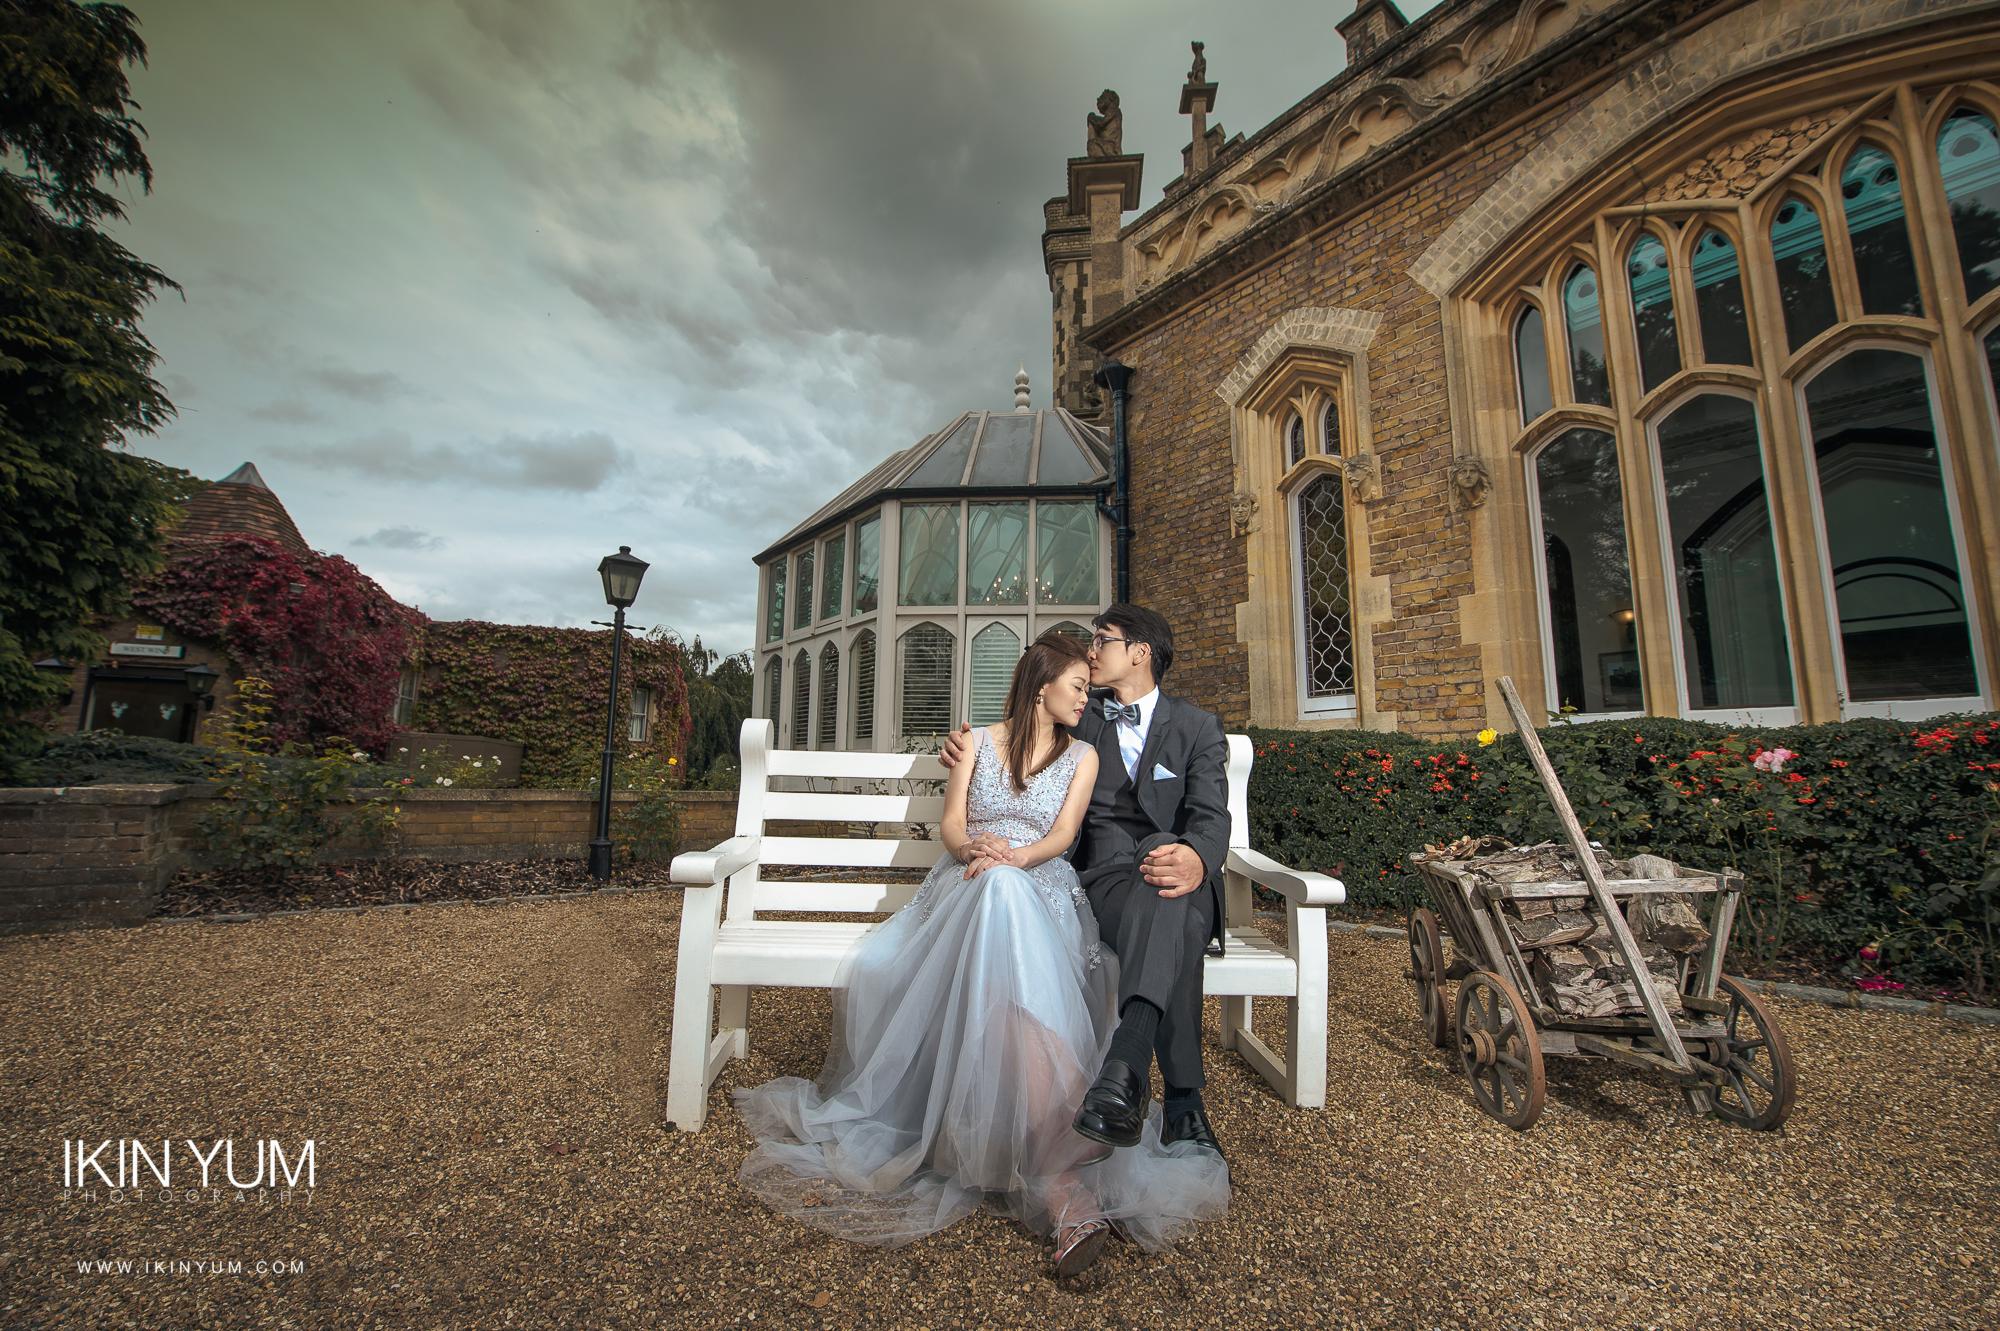 The oakley court Pre-Wedding Shoot - Ikin Yum Photography-050.jpg